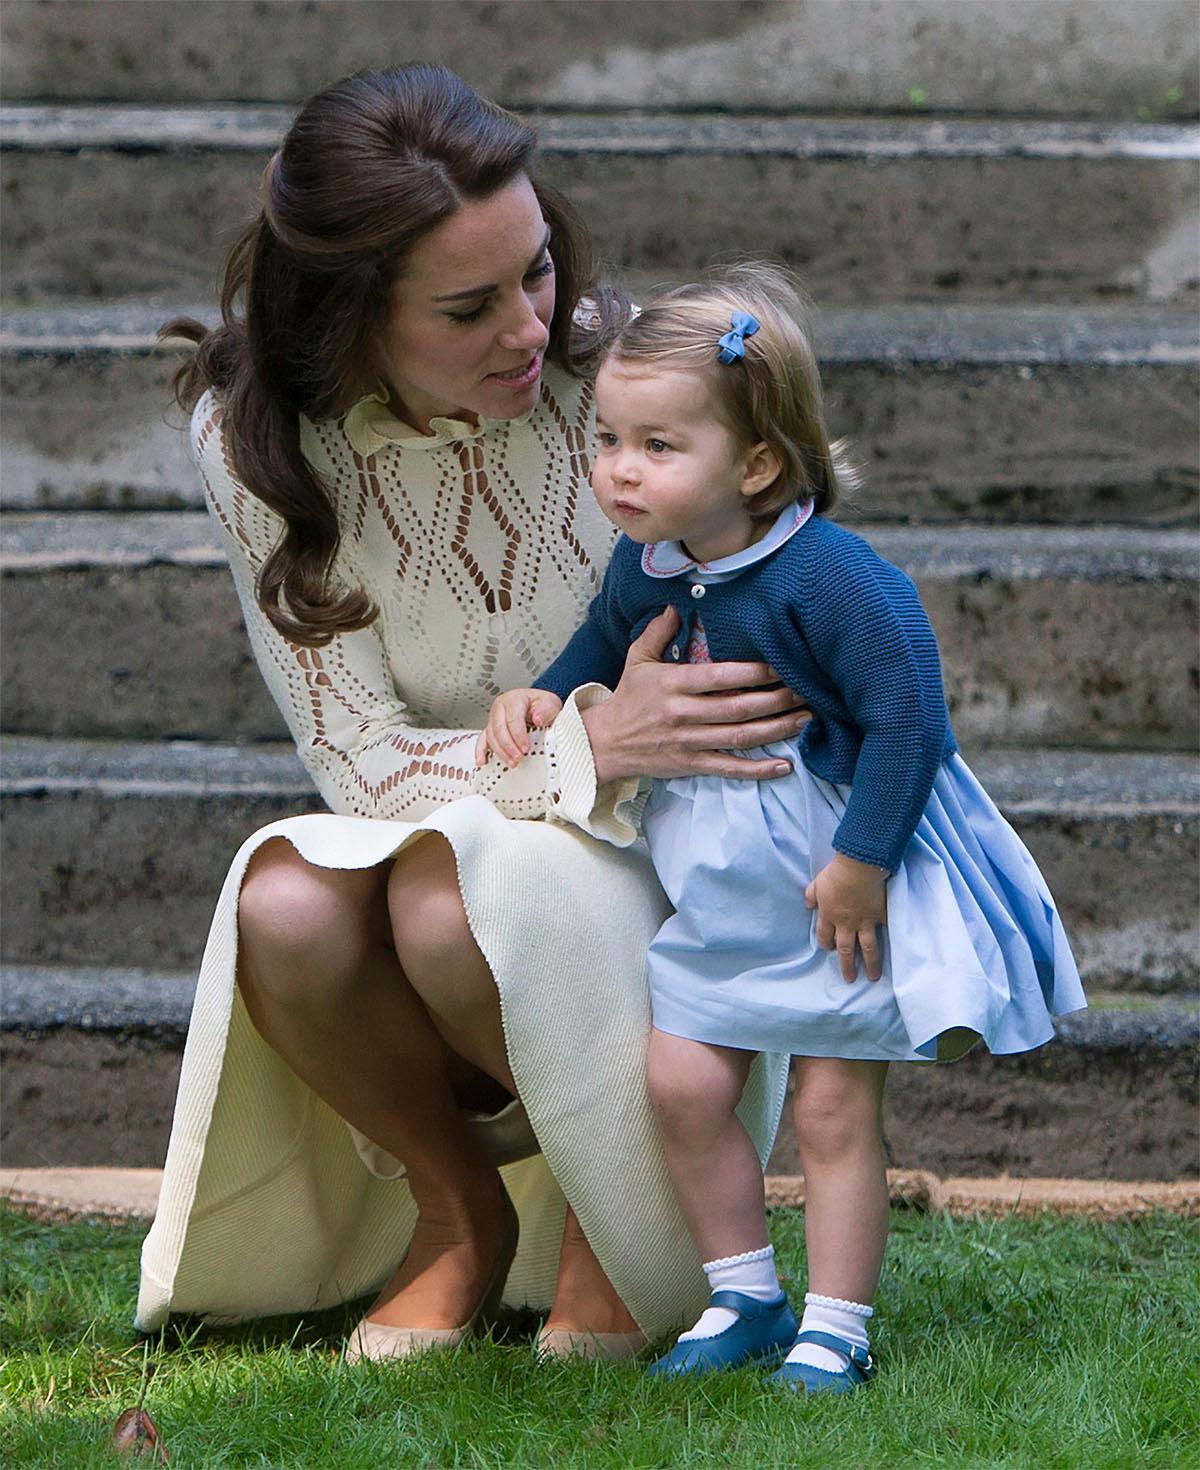 Photos: Littlest Royals Charm Canada During Victoria, B.C